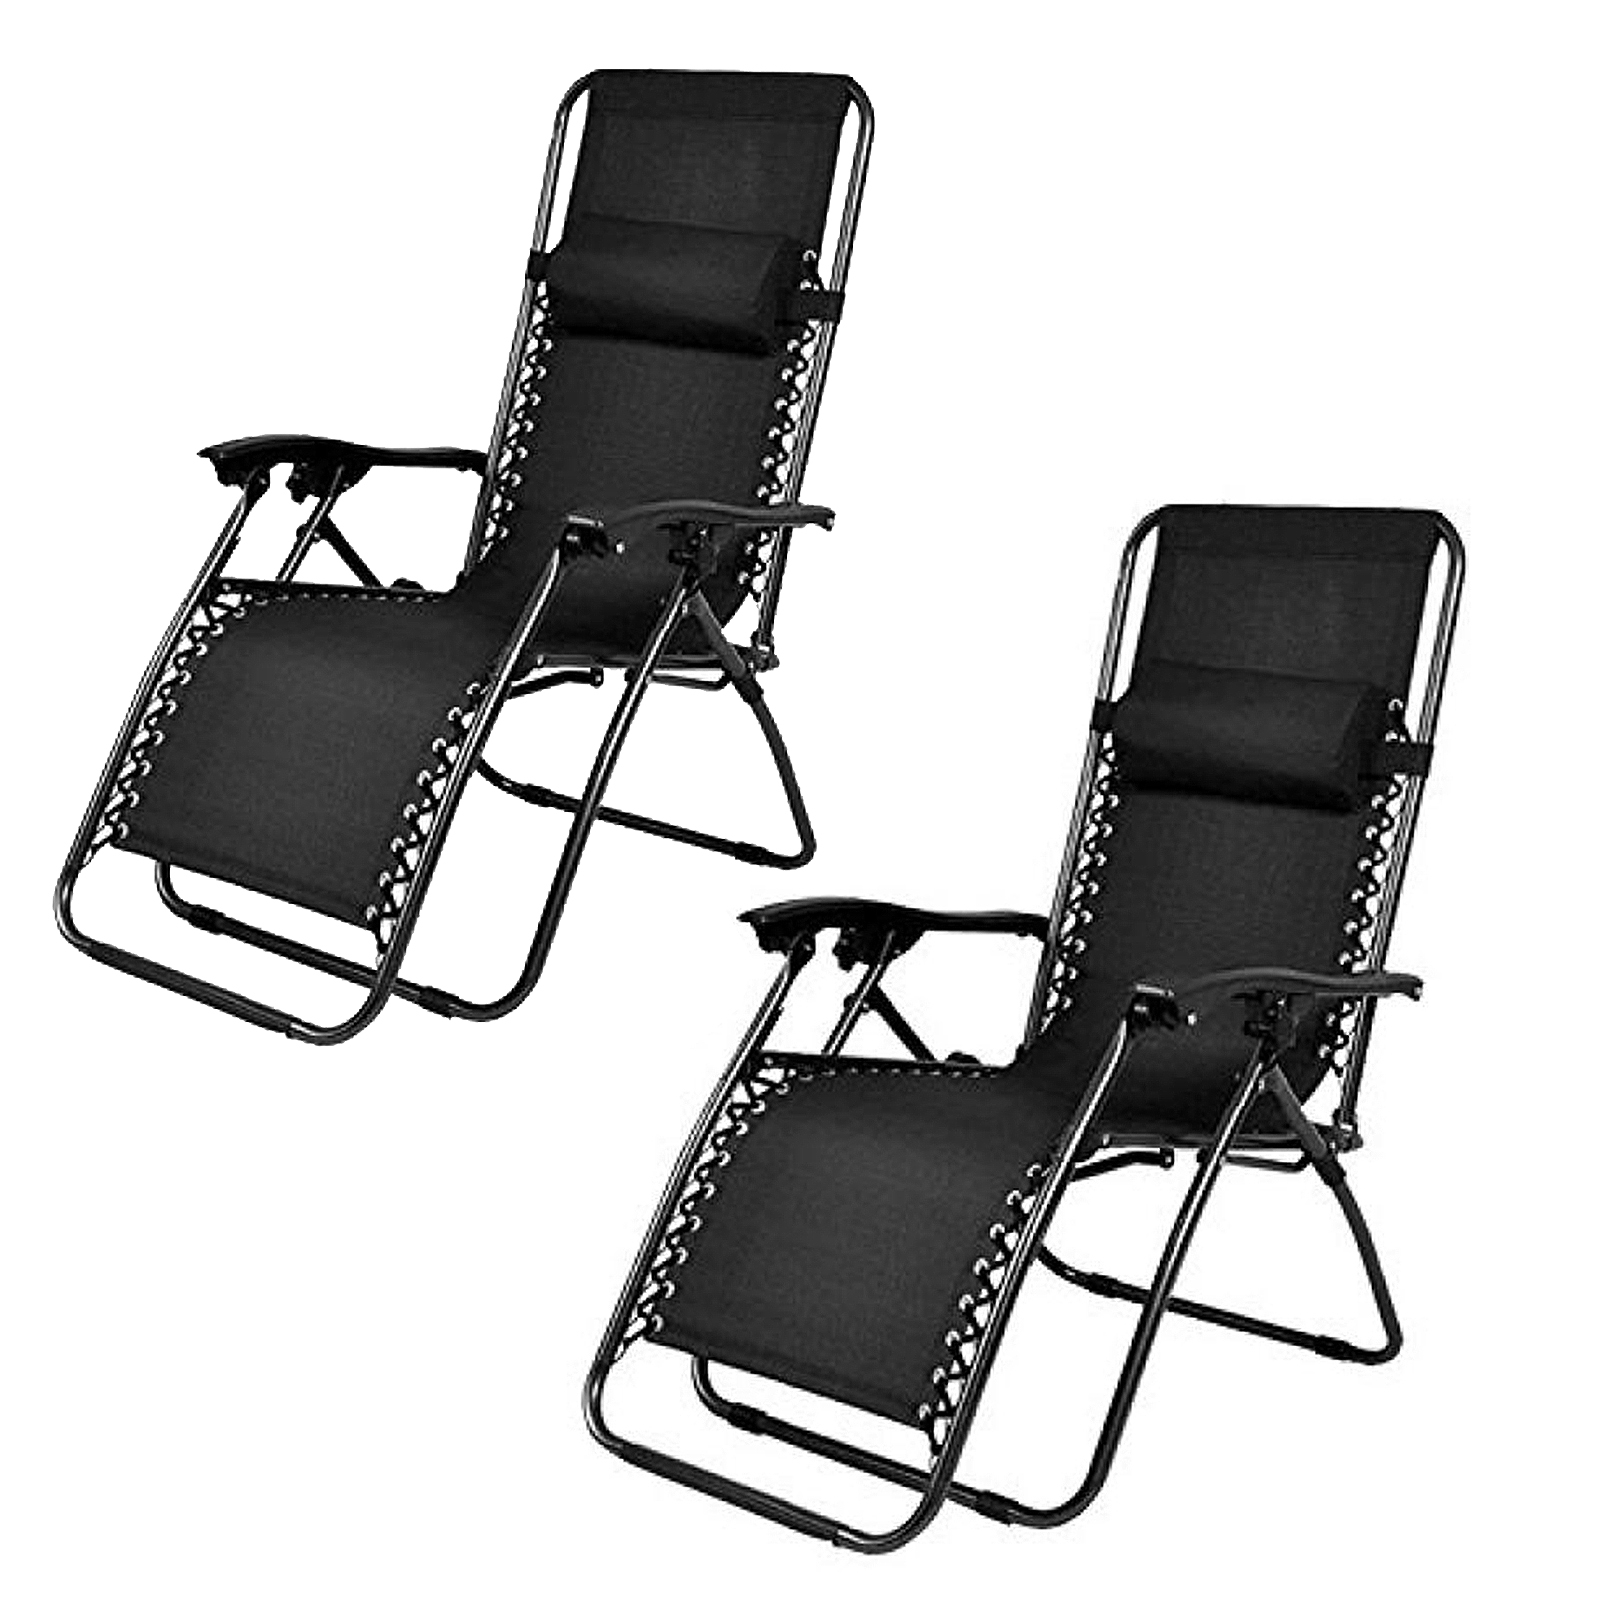 zero gravity outdoor chairs glider chair for nursery caravan canopy 2pc set sears marketplace steel black